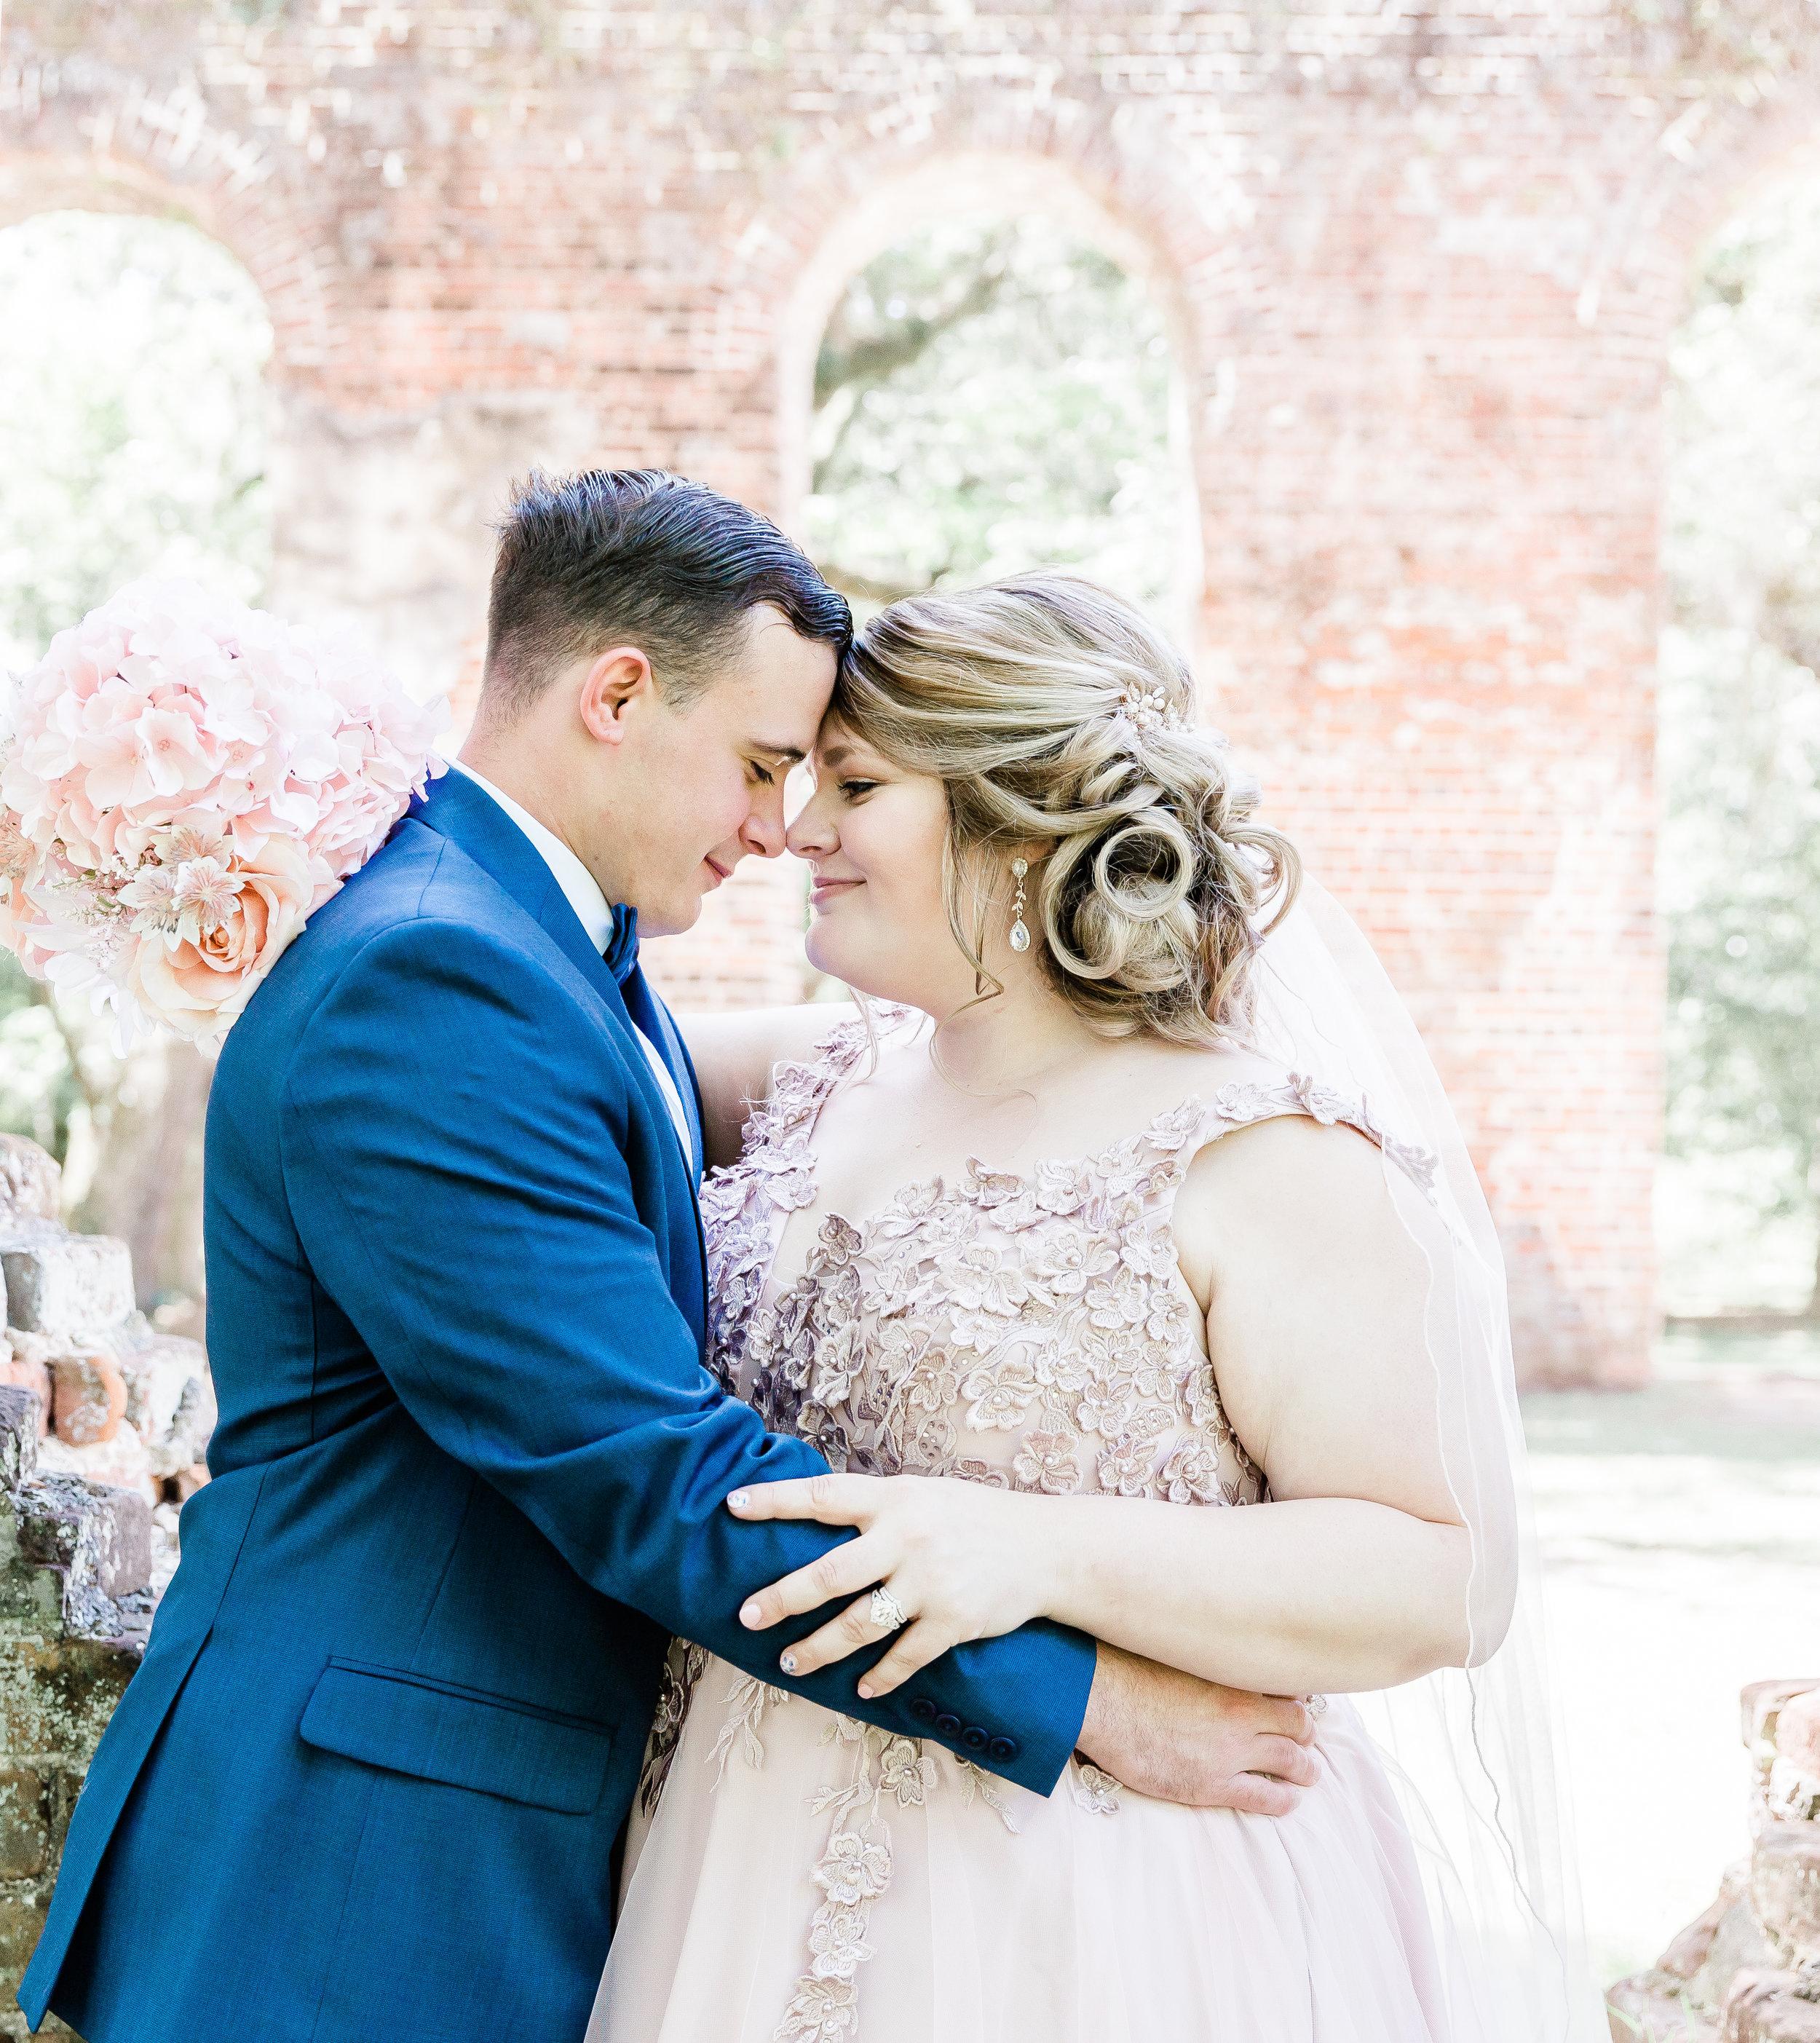 20190417-Southern Lens Photography-savannah family photographer- Ashley and Zack-old sheldon church ruins-201962.jpg